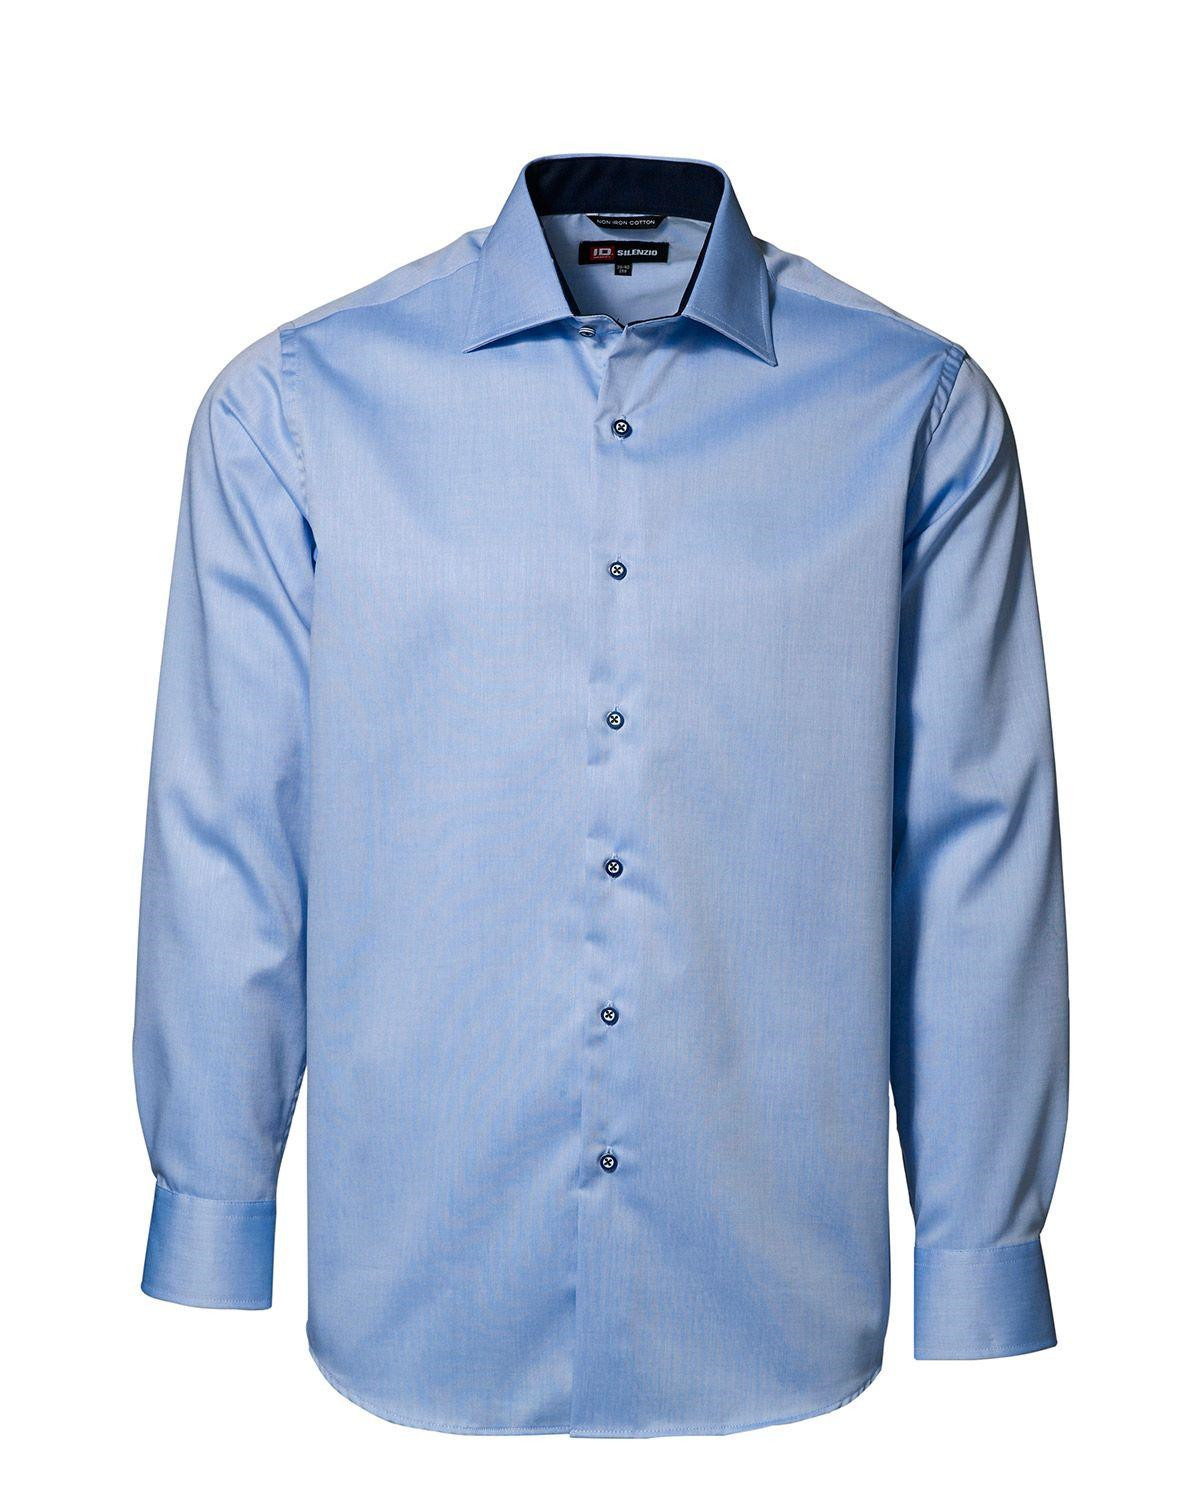 Image of   ID Easy Iron-skjorte (Lyseblå, 47 / 48)